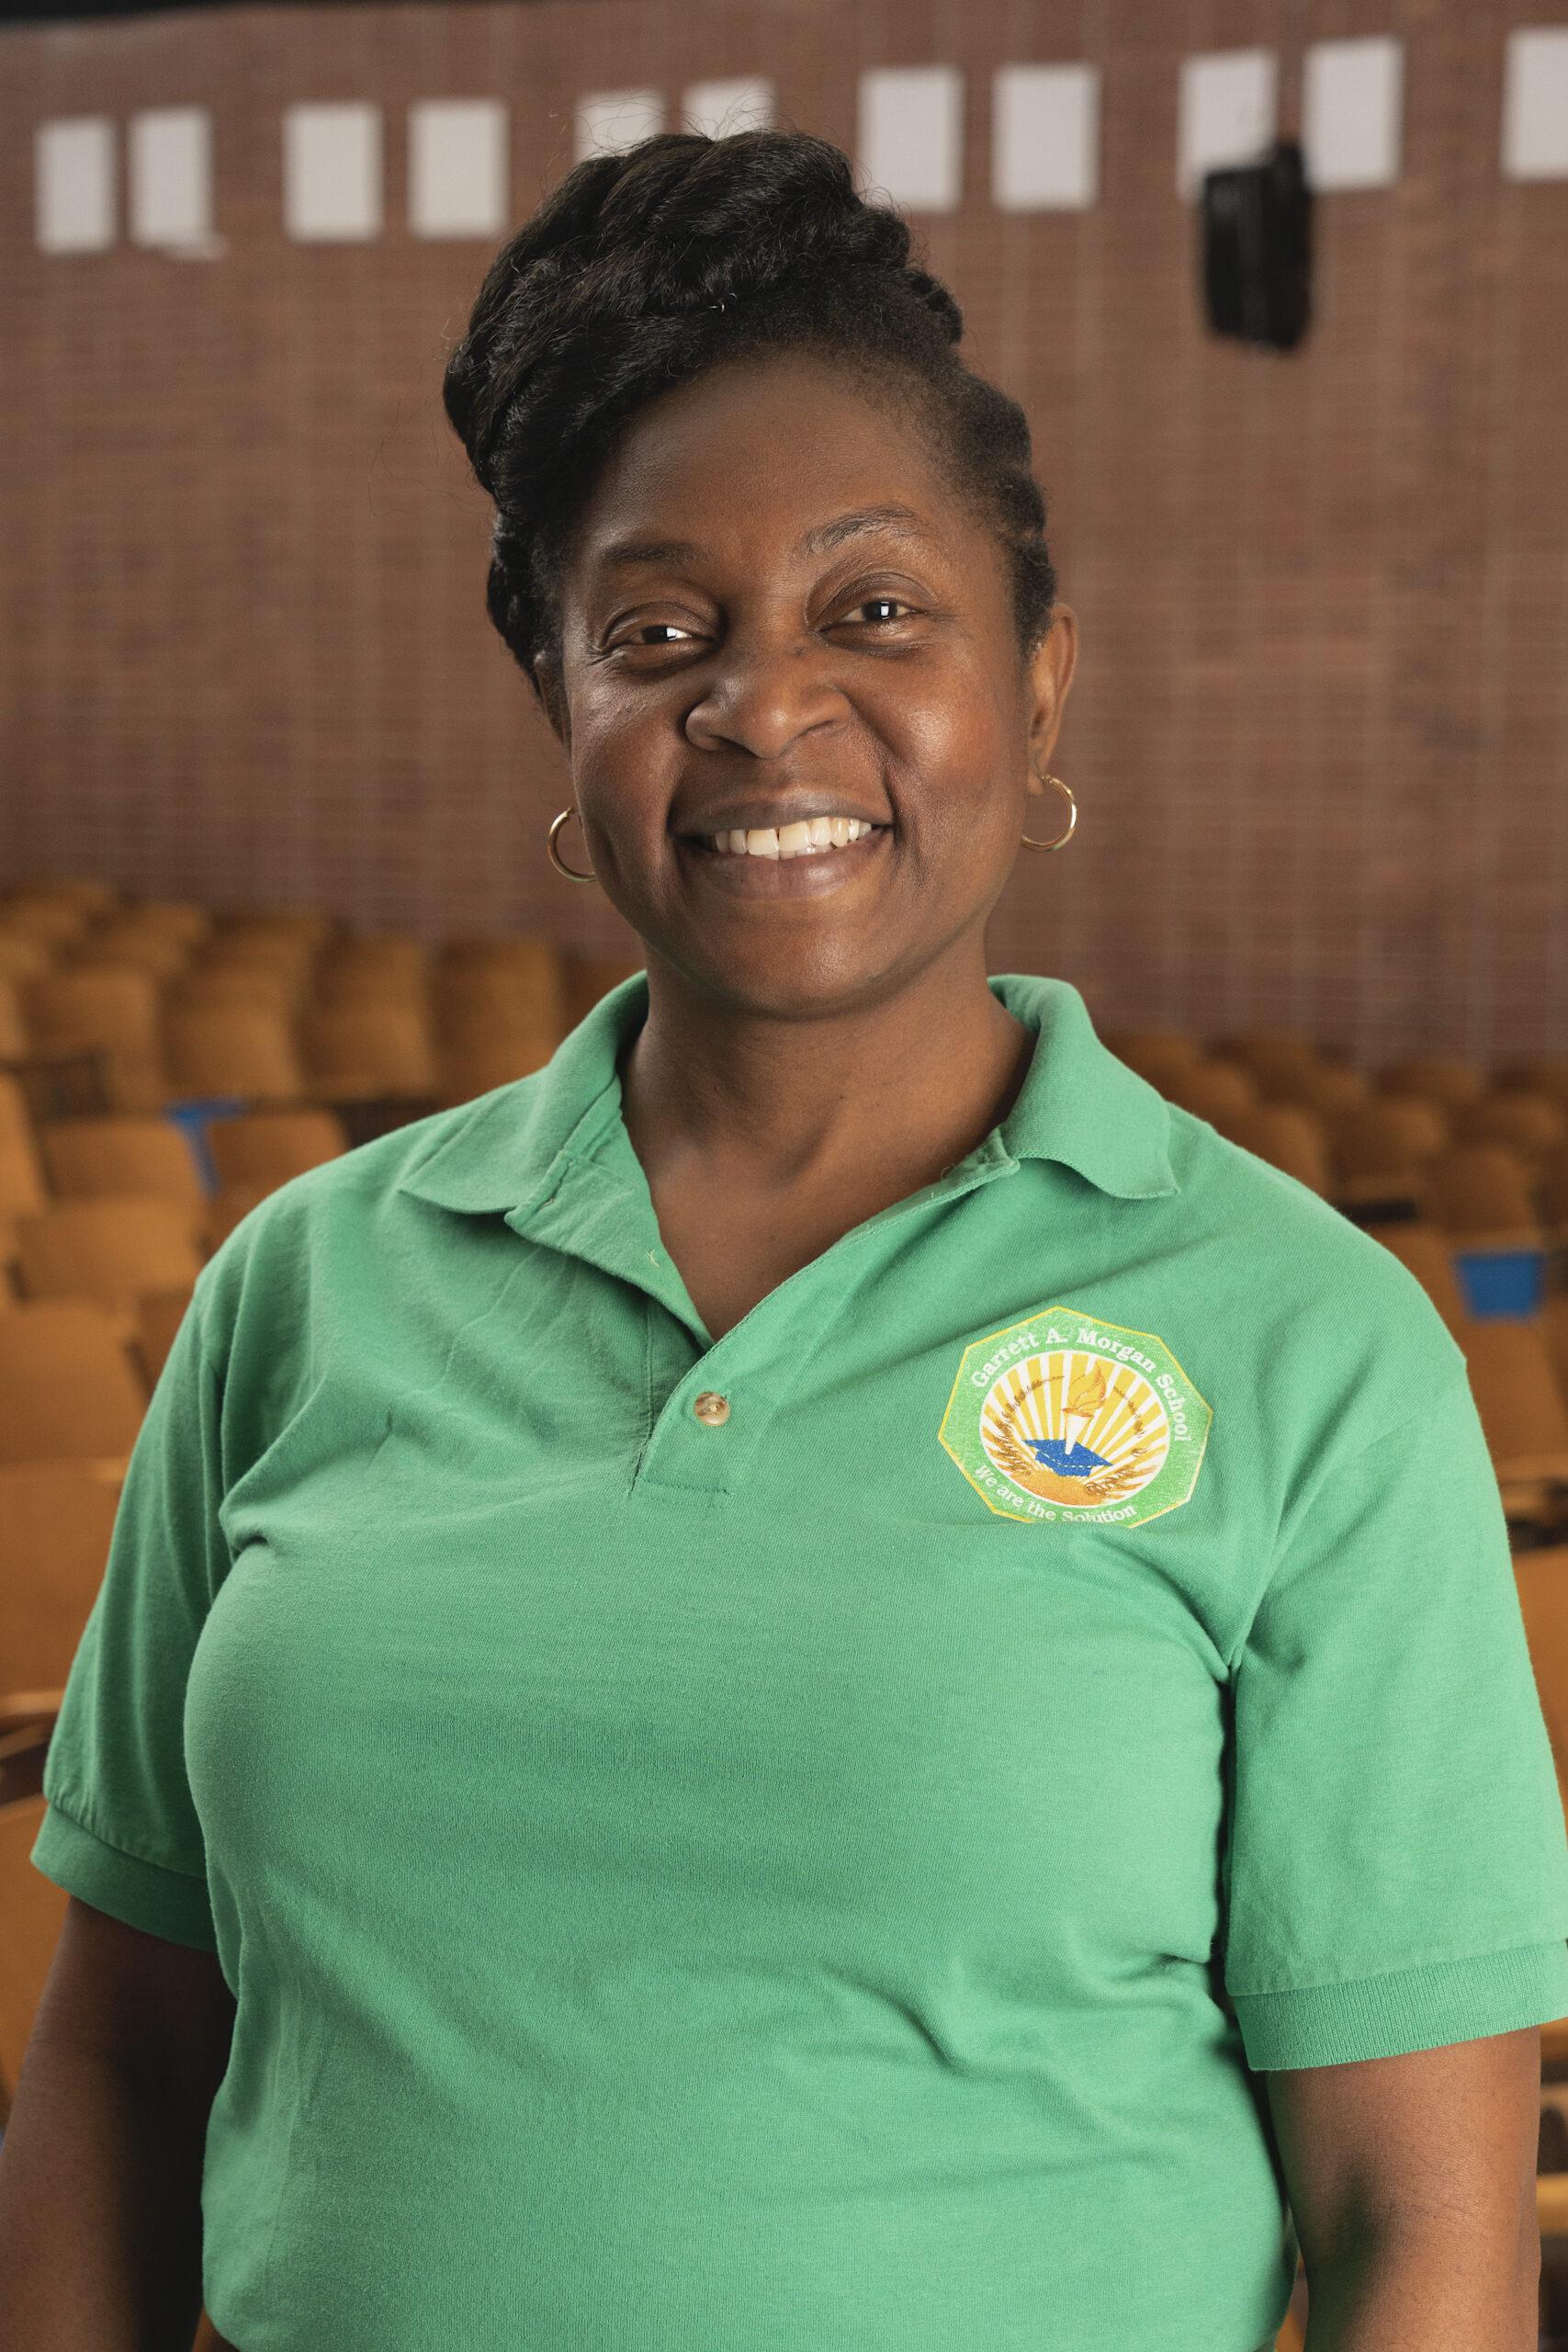 Mrs. Graham-Jones